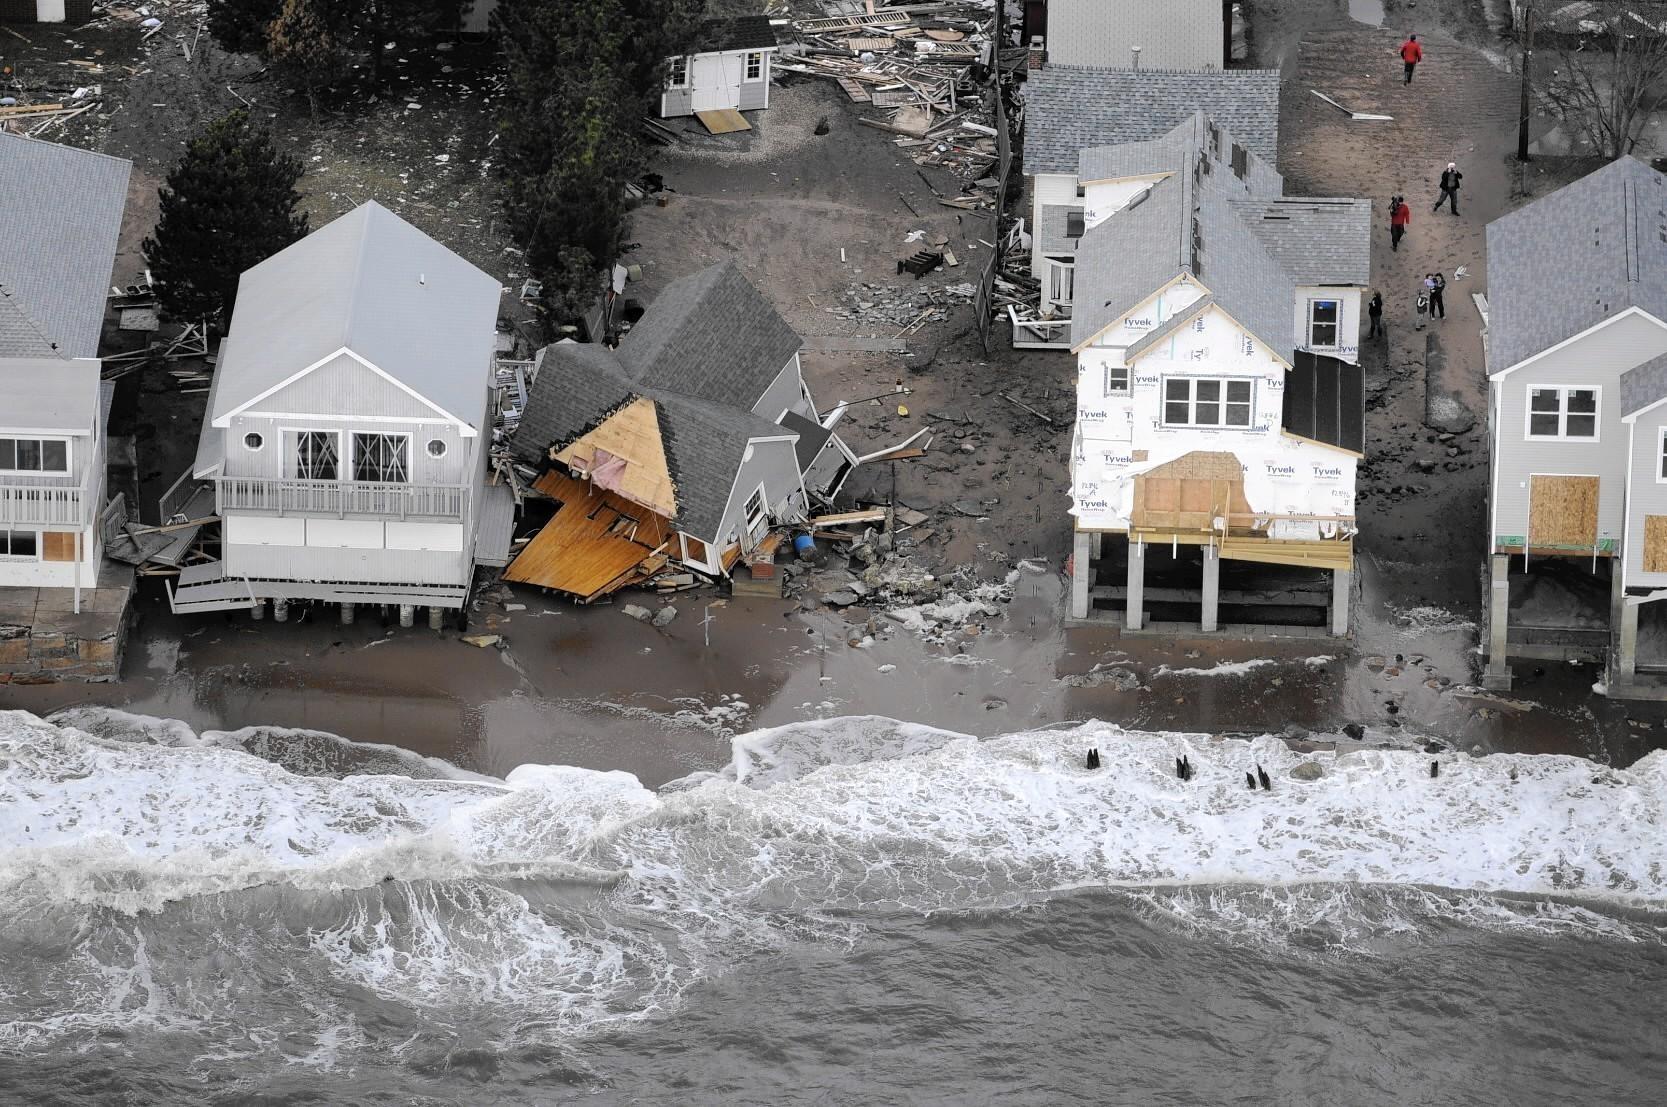 Hartford Flood Insurance >> Storm Sandy Insurers Battle Flood Claim Lawsuits - Hartford Courant